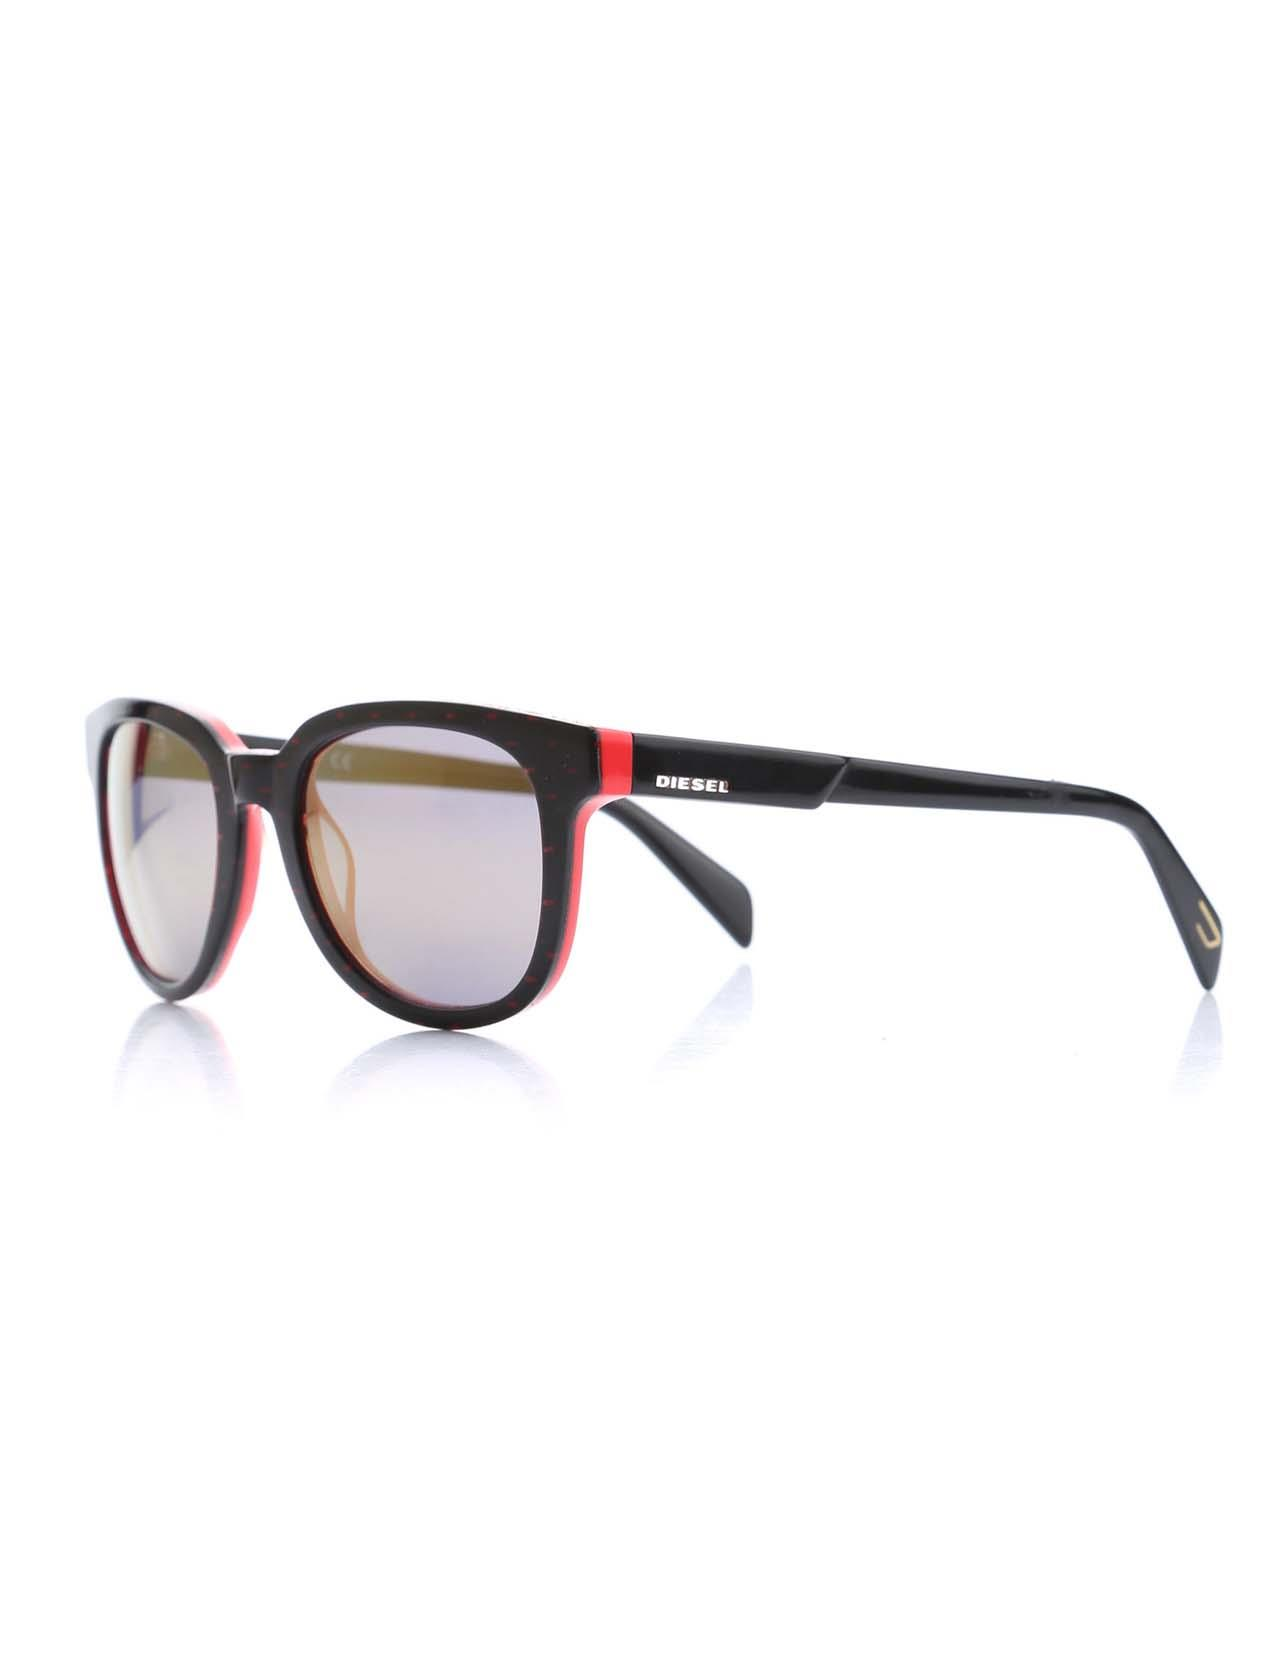 Women's sunglasses dl 0137 68l bone color organic oval aval 52-21-140 diesel